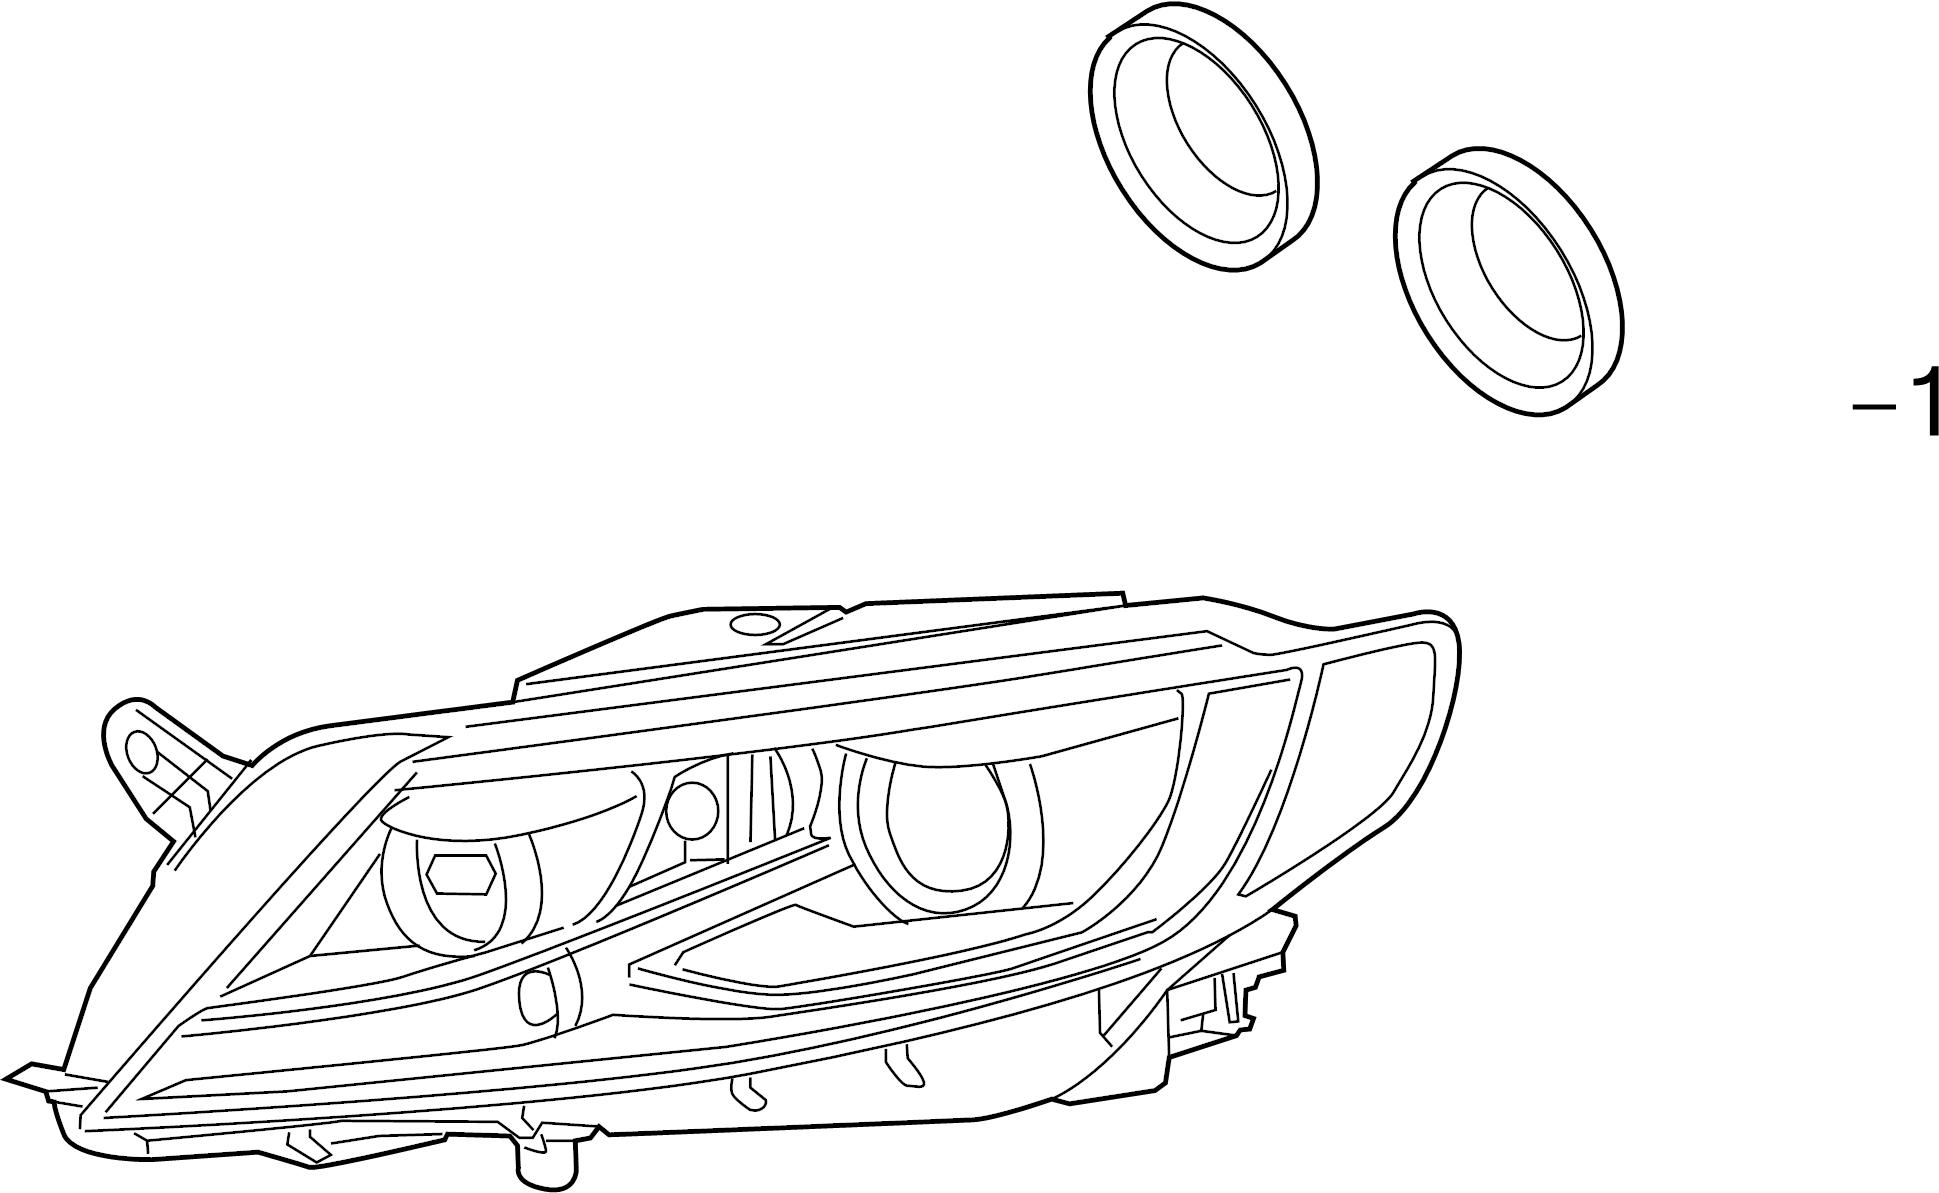 2016 volkswagen cc headlight bulb cap  front  rear  lower   lights  running  led